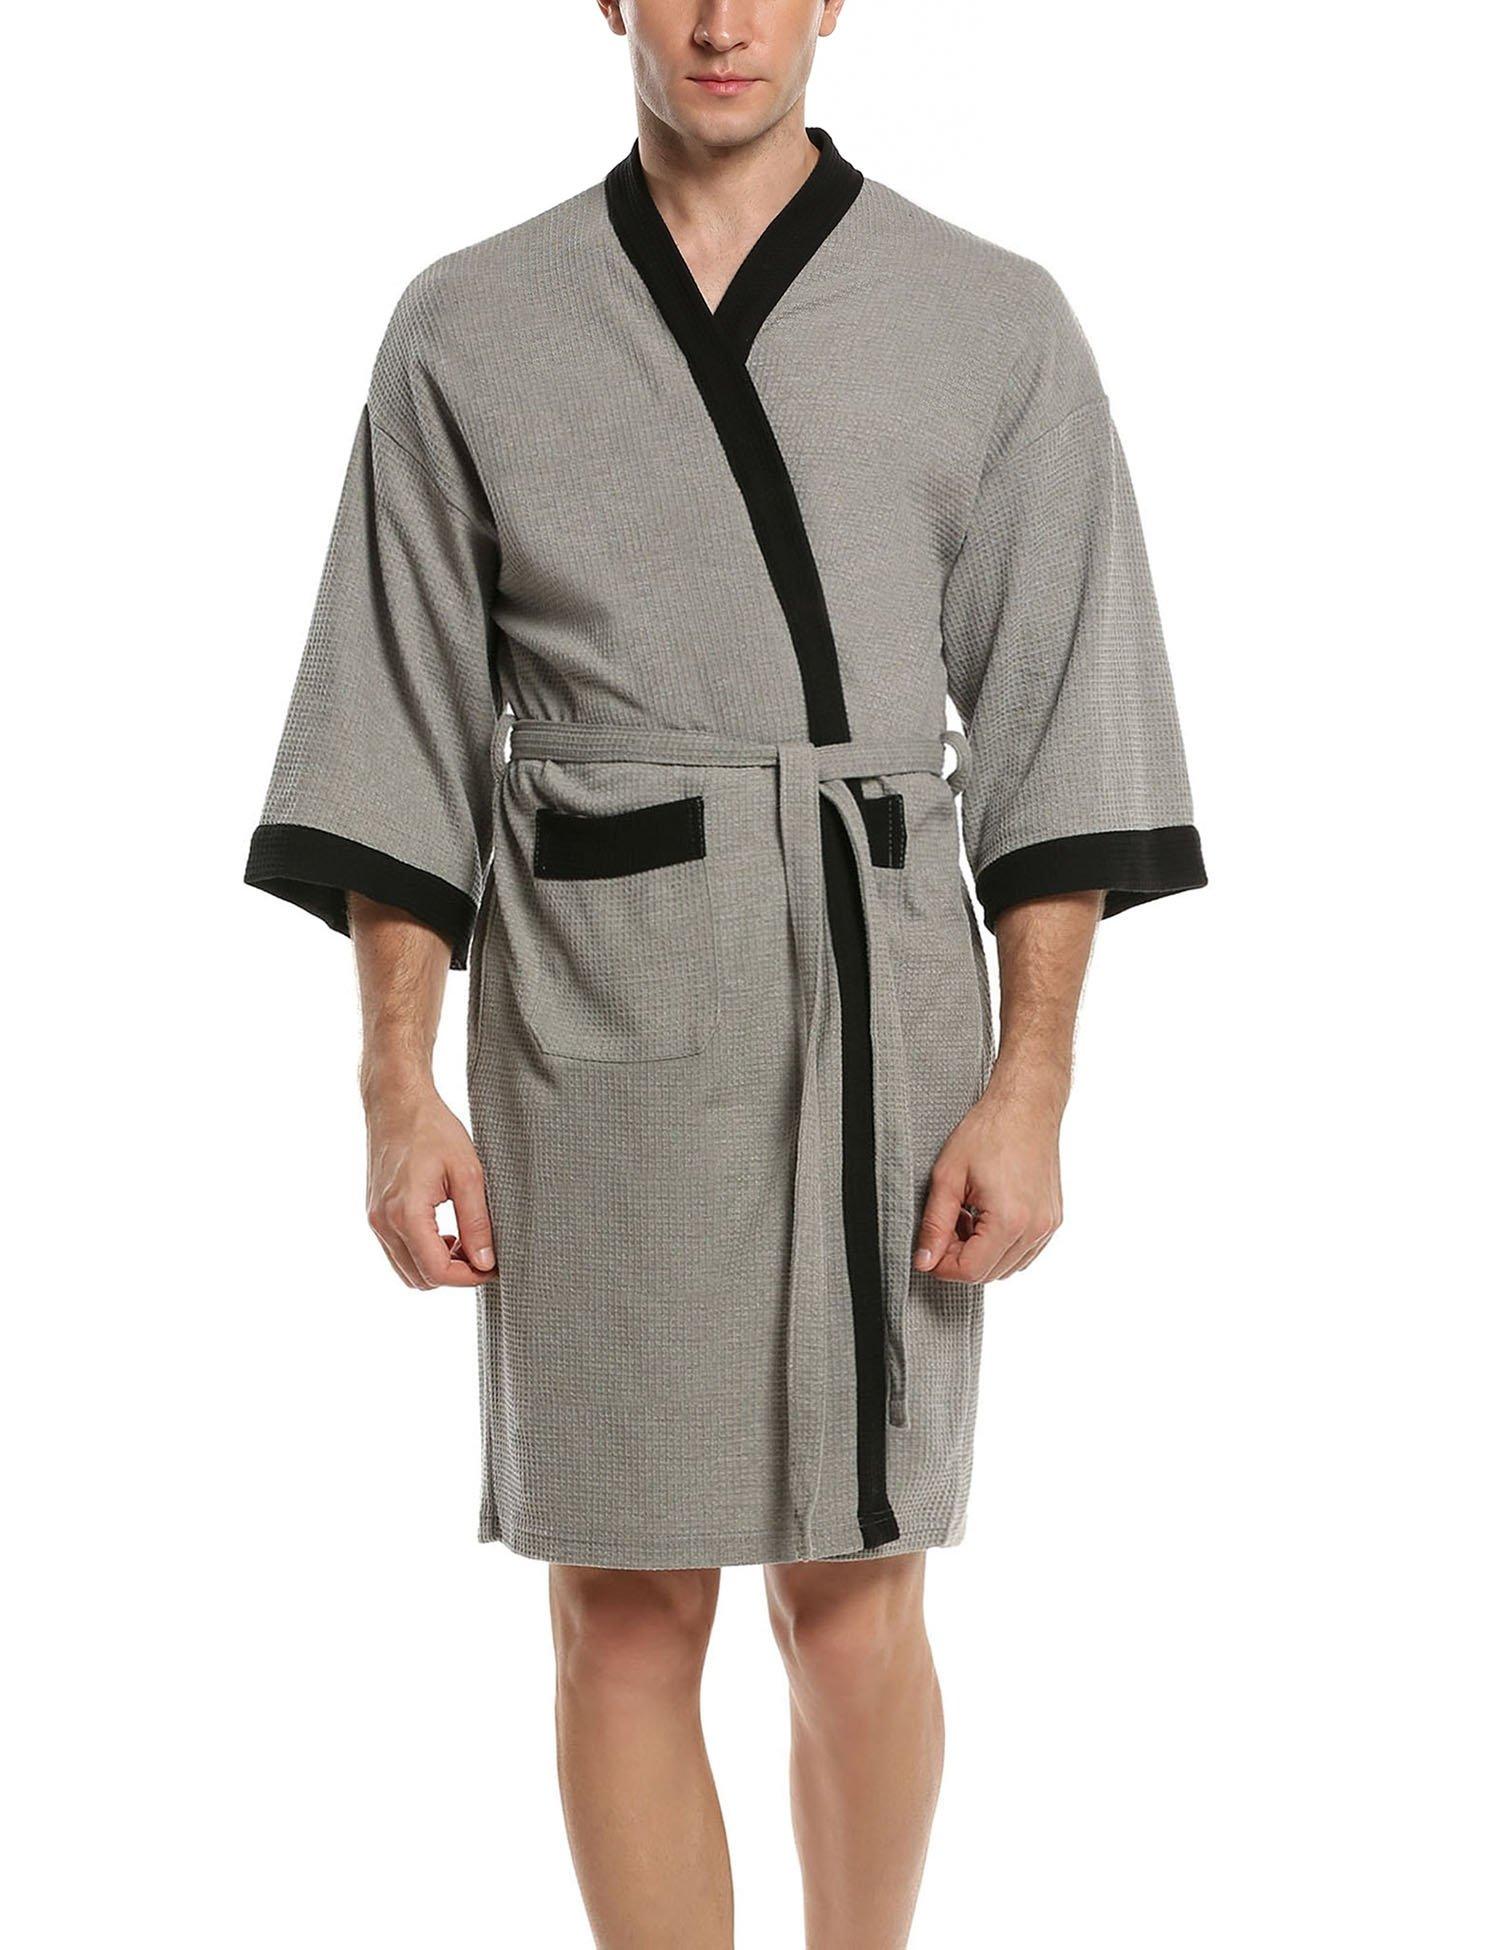 HOTOUCH Men's Waffle Kimono Robe Grey Black M